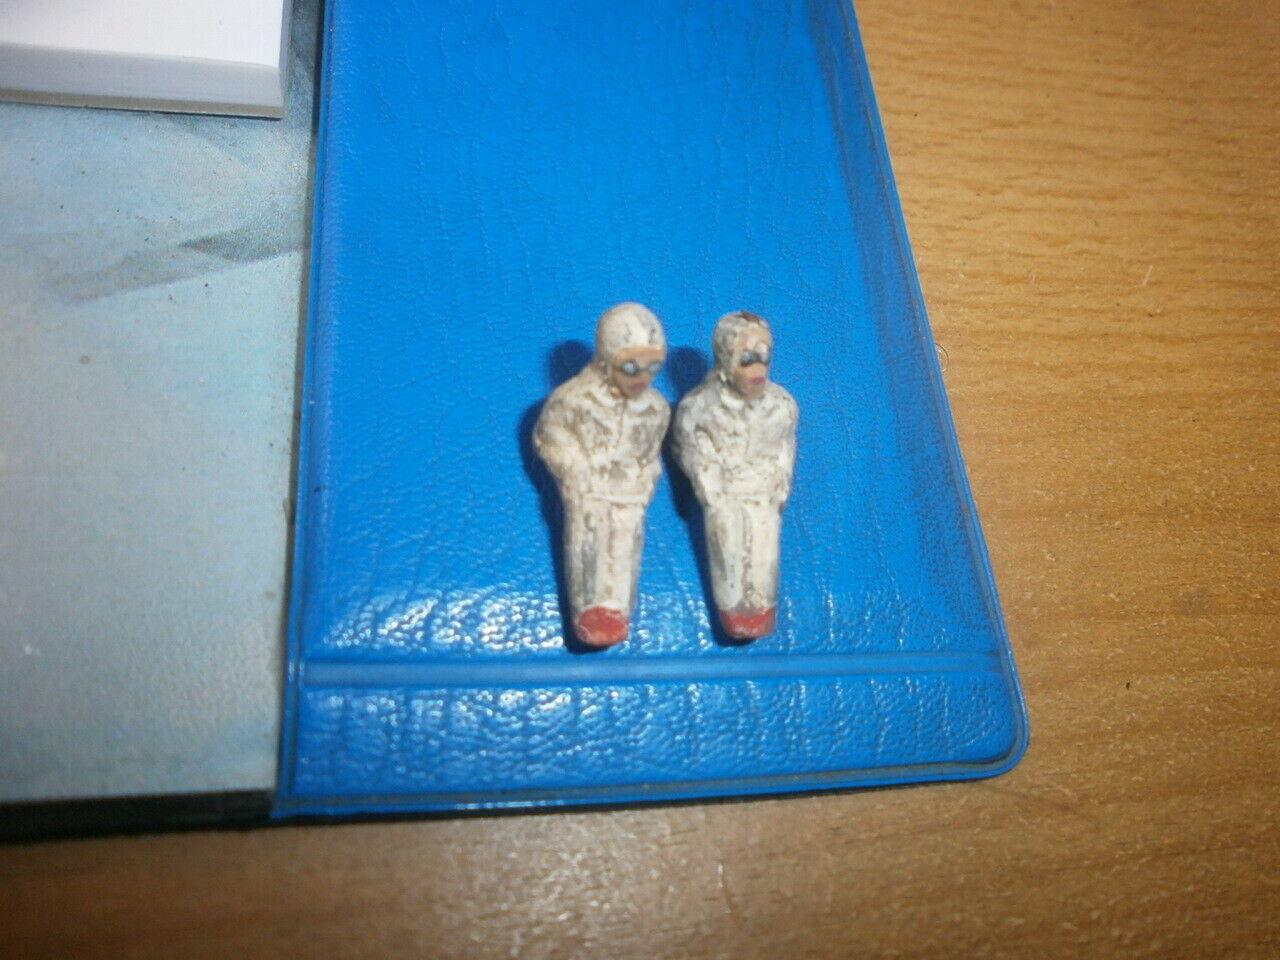 Konvolut 2 Märklin Figuras de Masa para 2.8cm Piloto Pequeño Antiguo Fundición